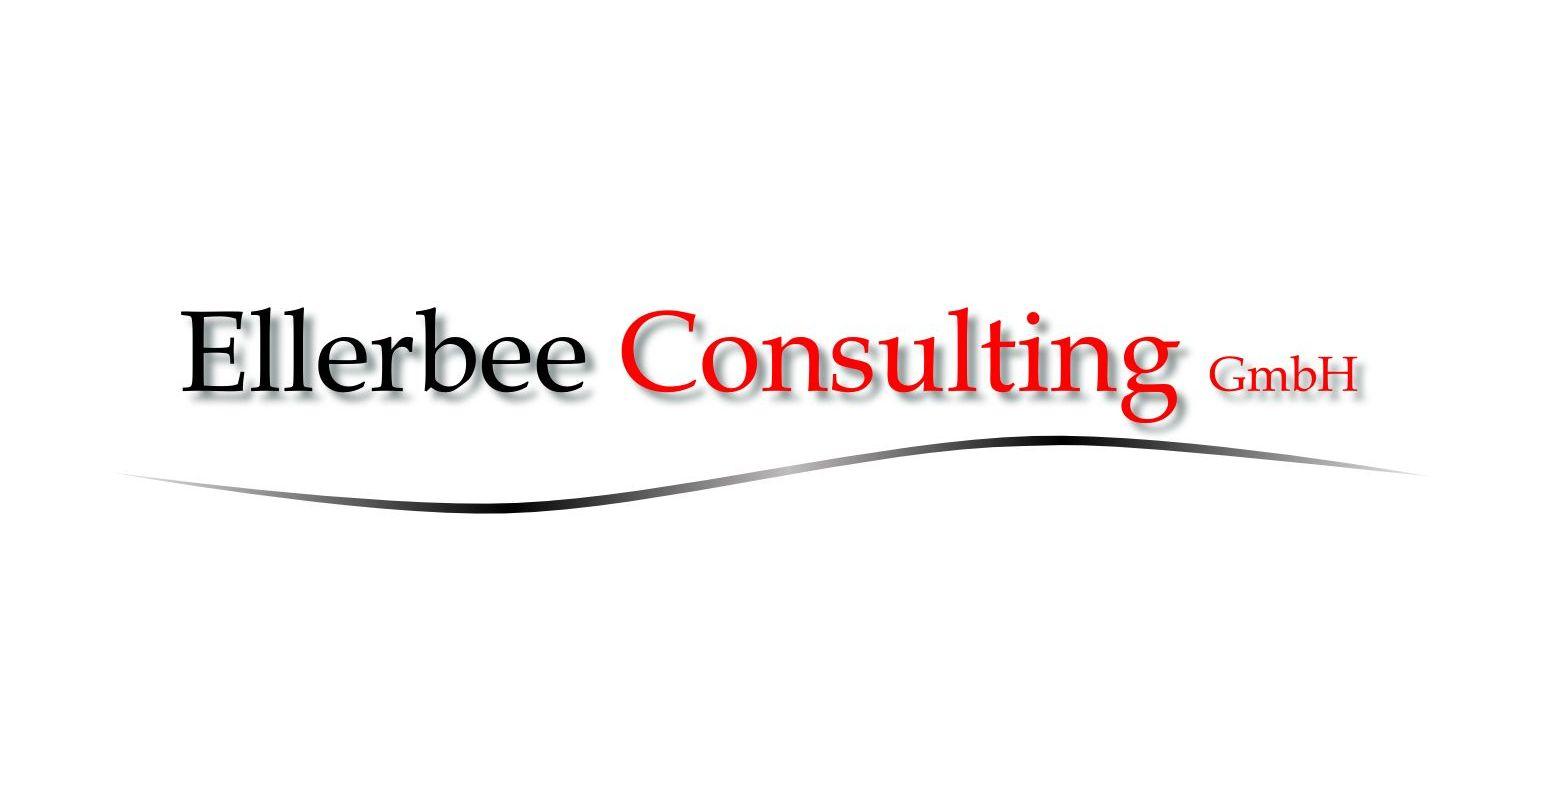 Ellerbee Consulting GmbH